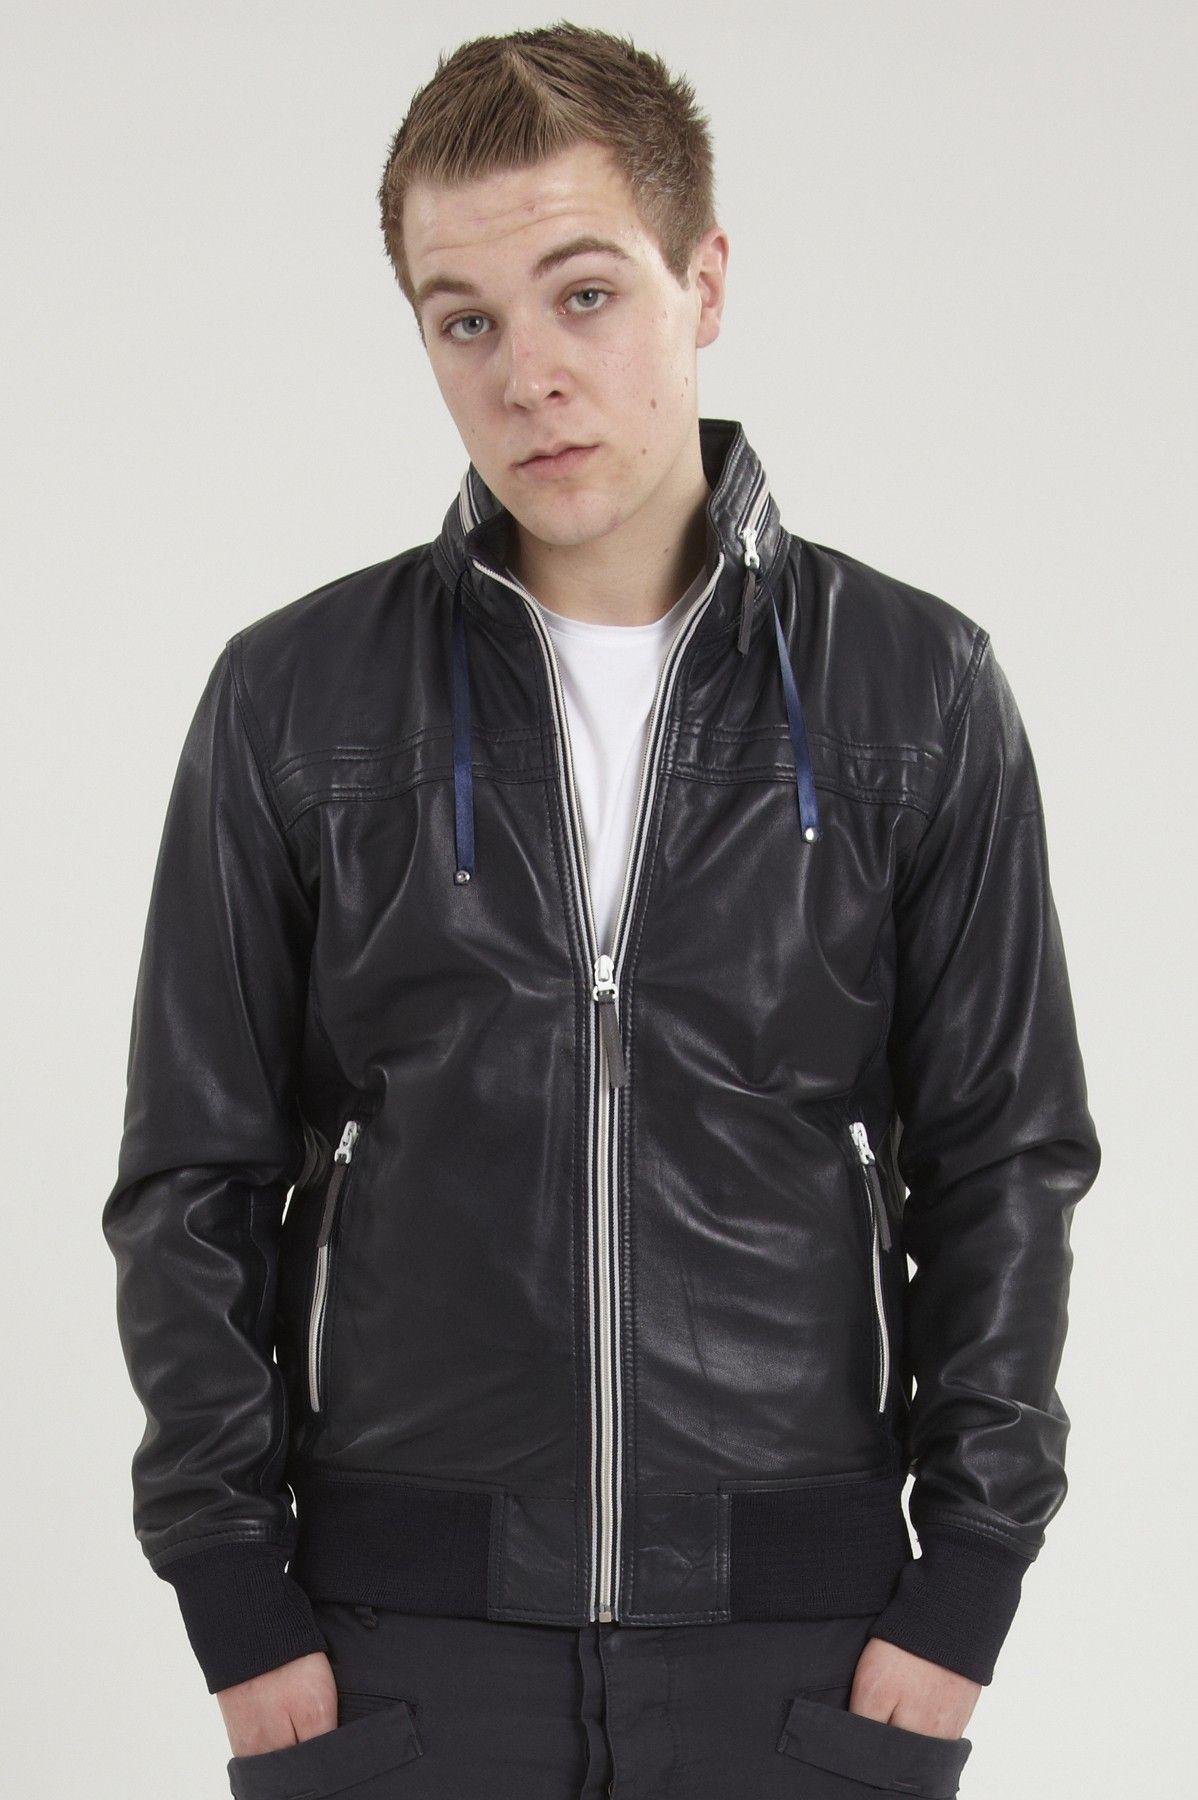 'RETRO' mens navy blue leather bomber jacket. Leather